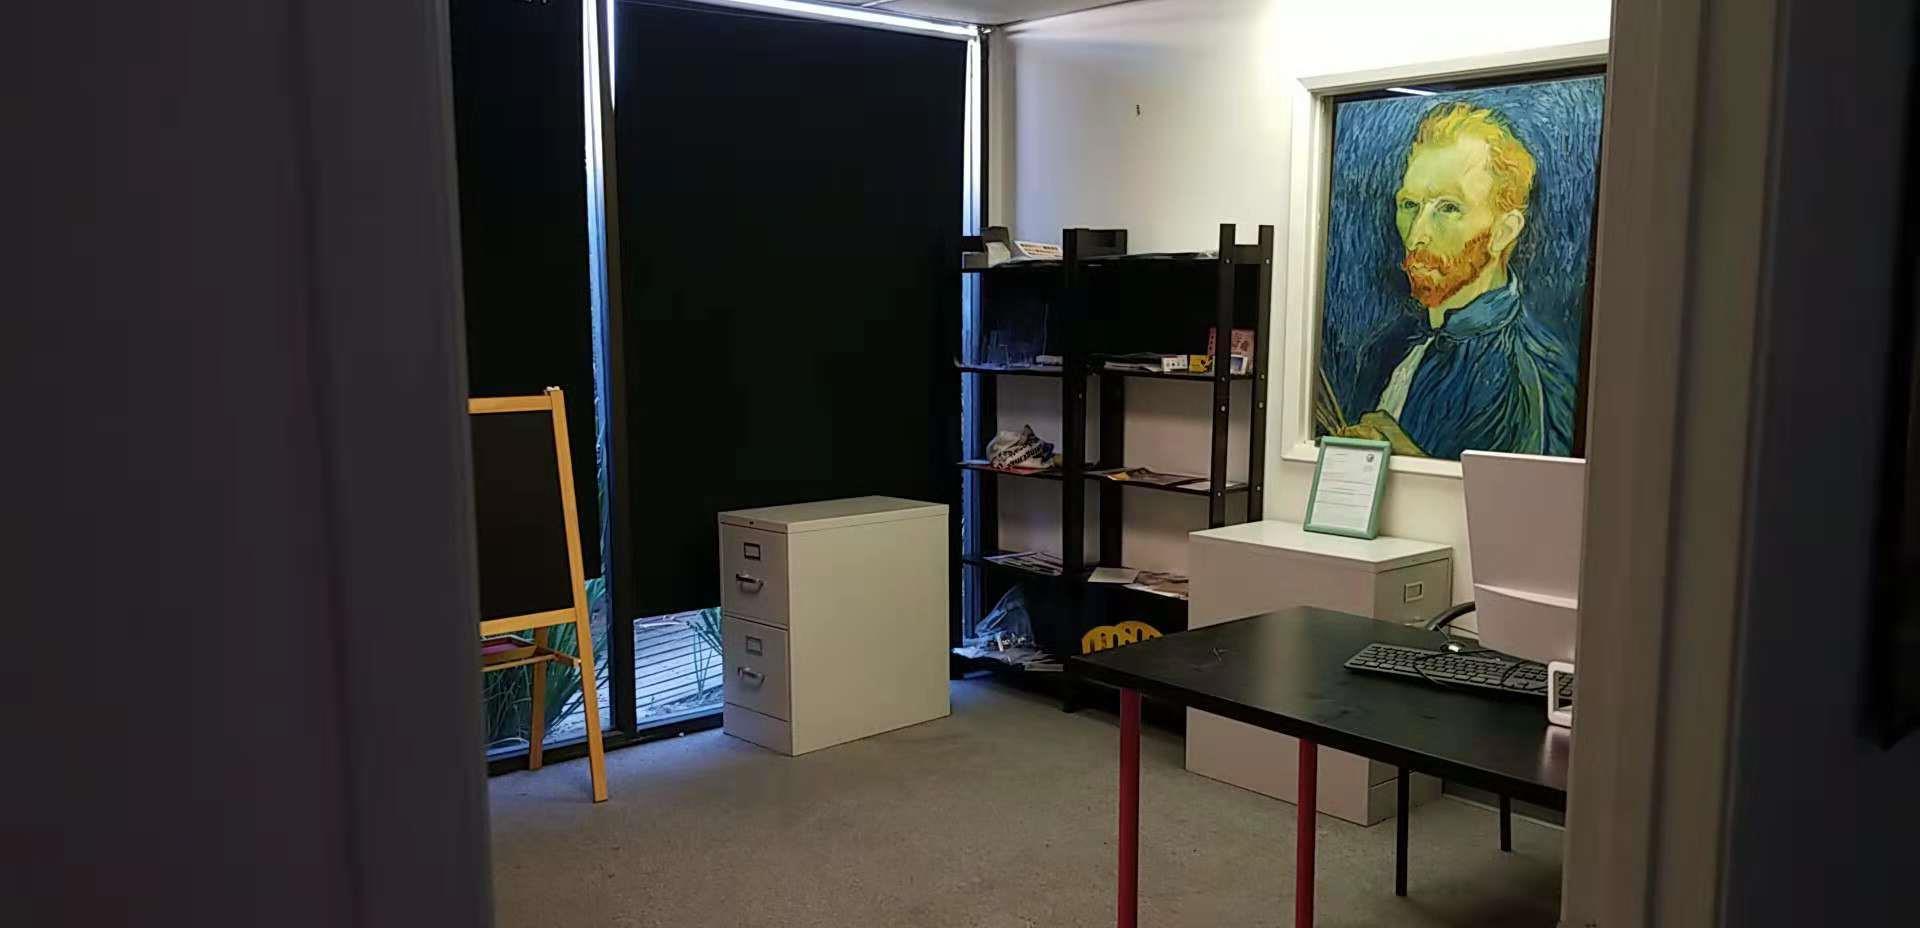 martian science - Office 2